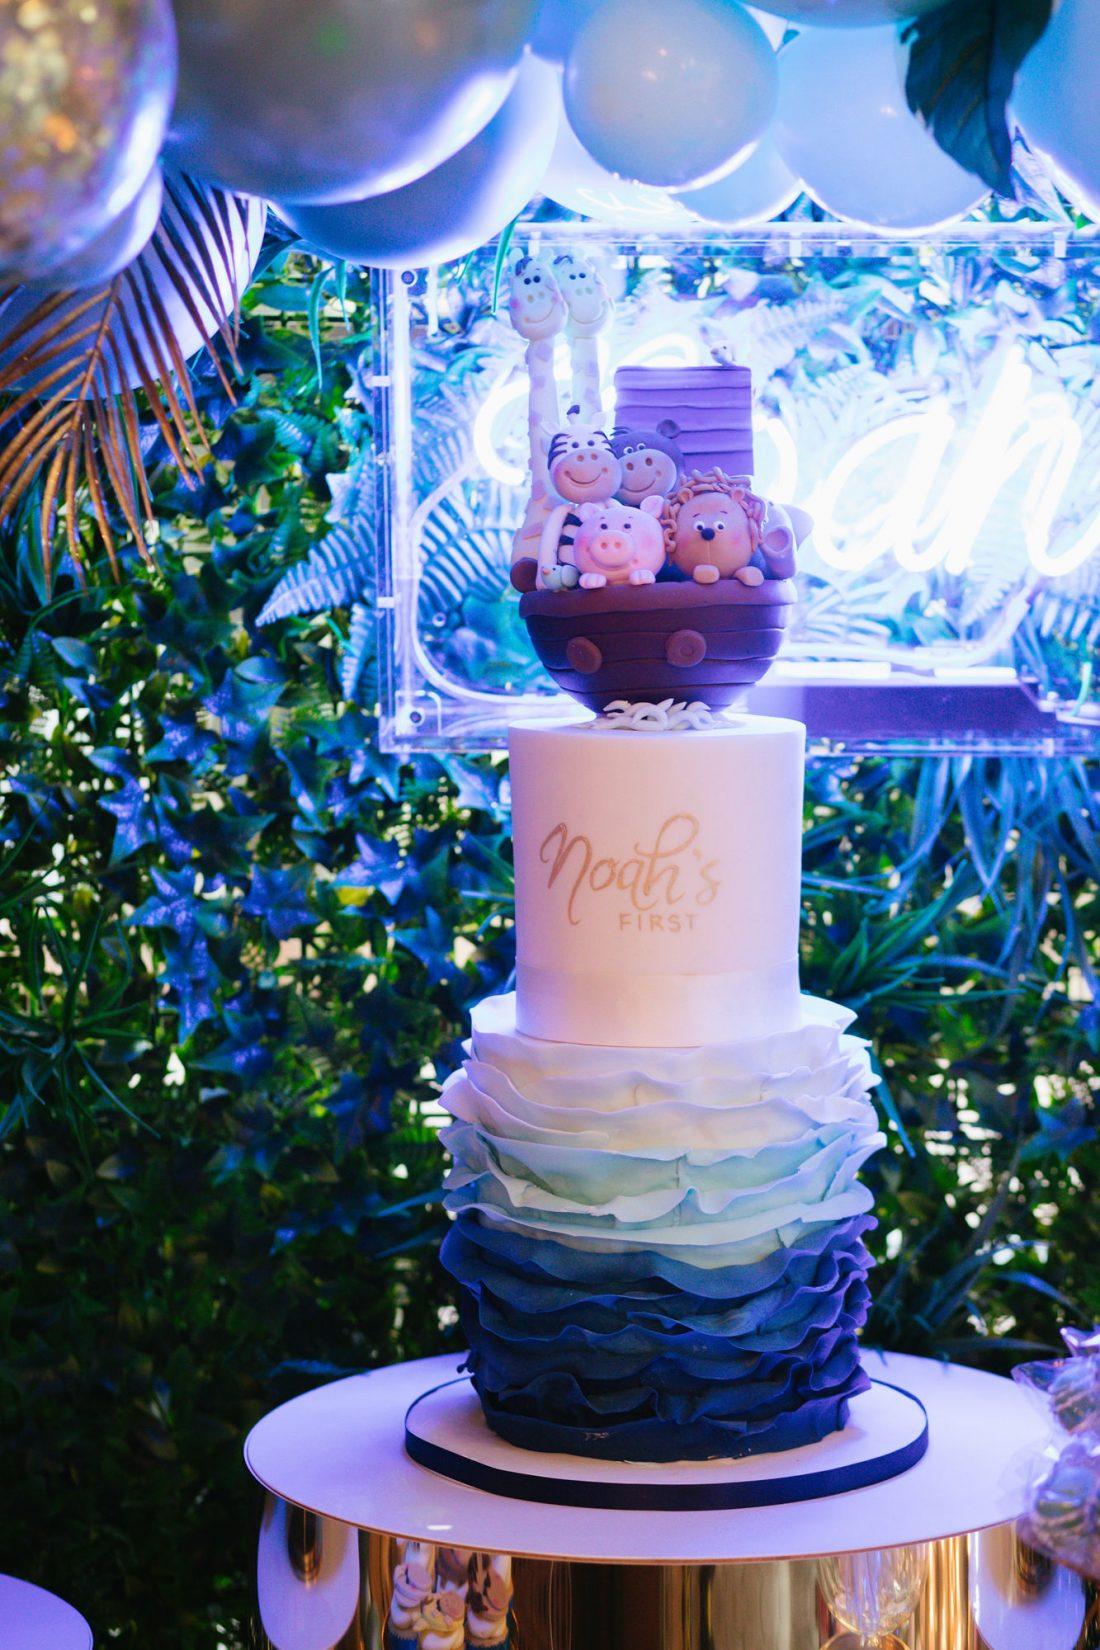 noah's-birthday-party-32.jpg